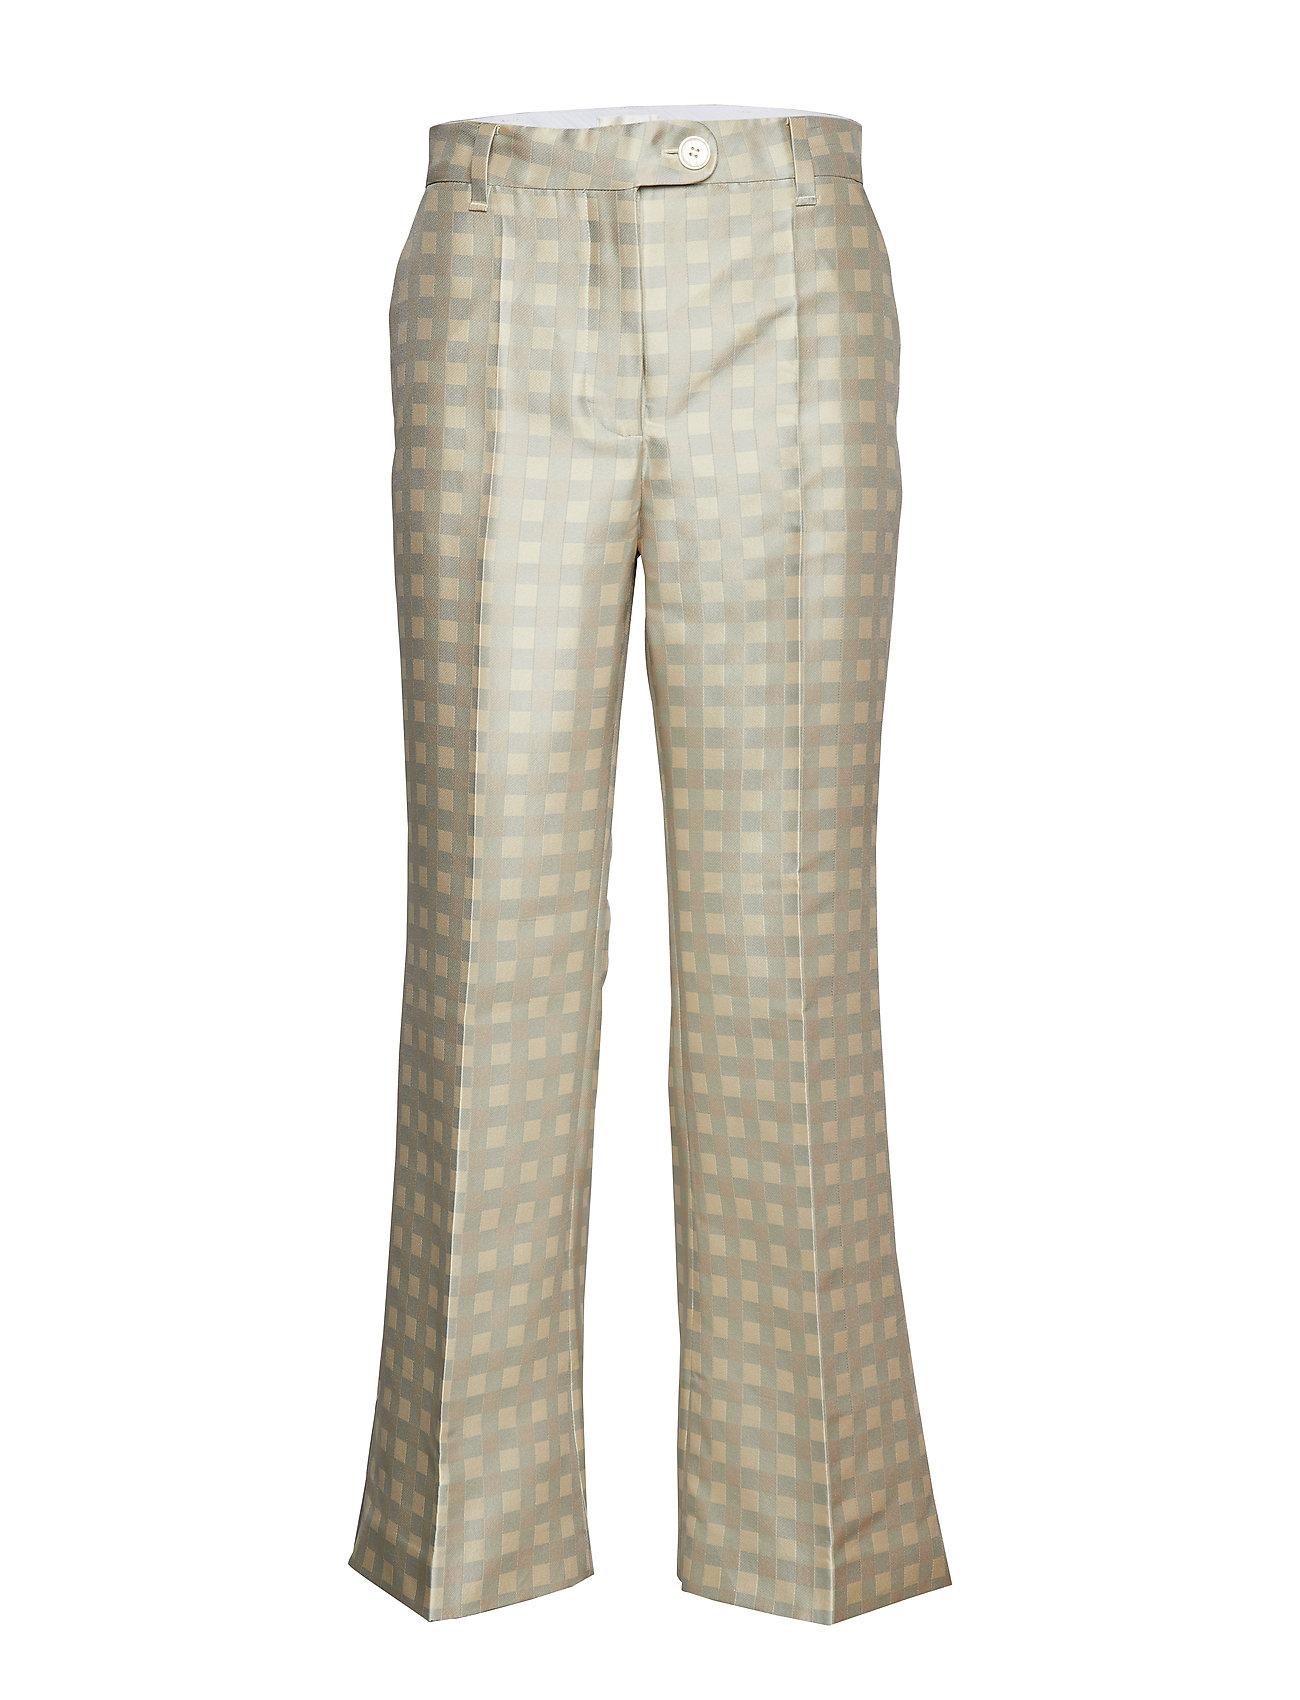 STINE GOYA Bob, 527 Mikado Tailoring - CHECKS